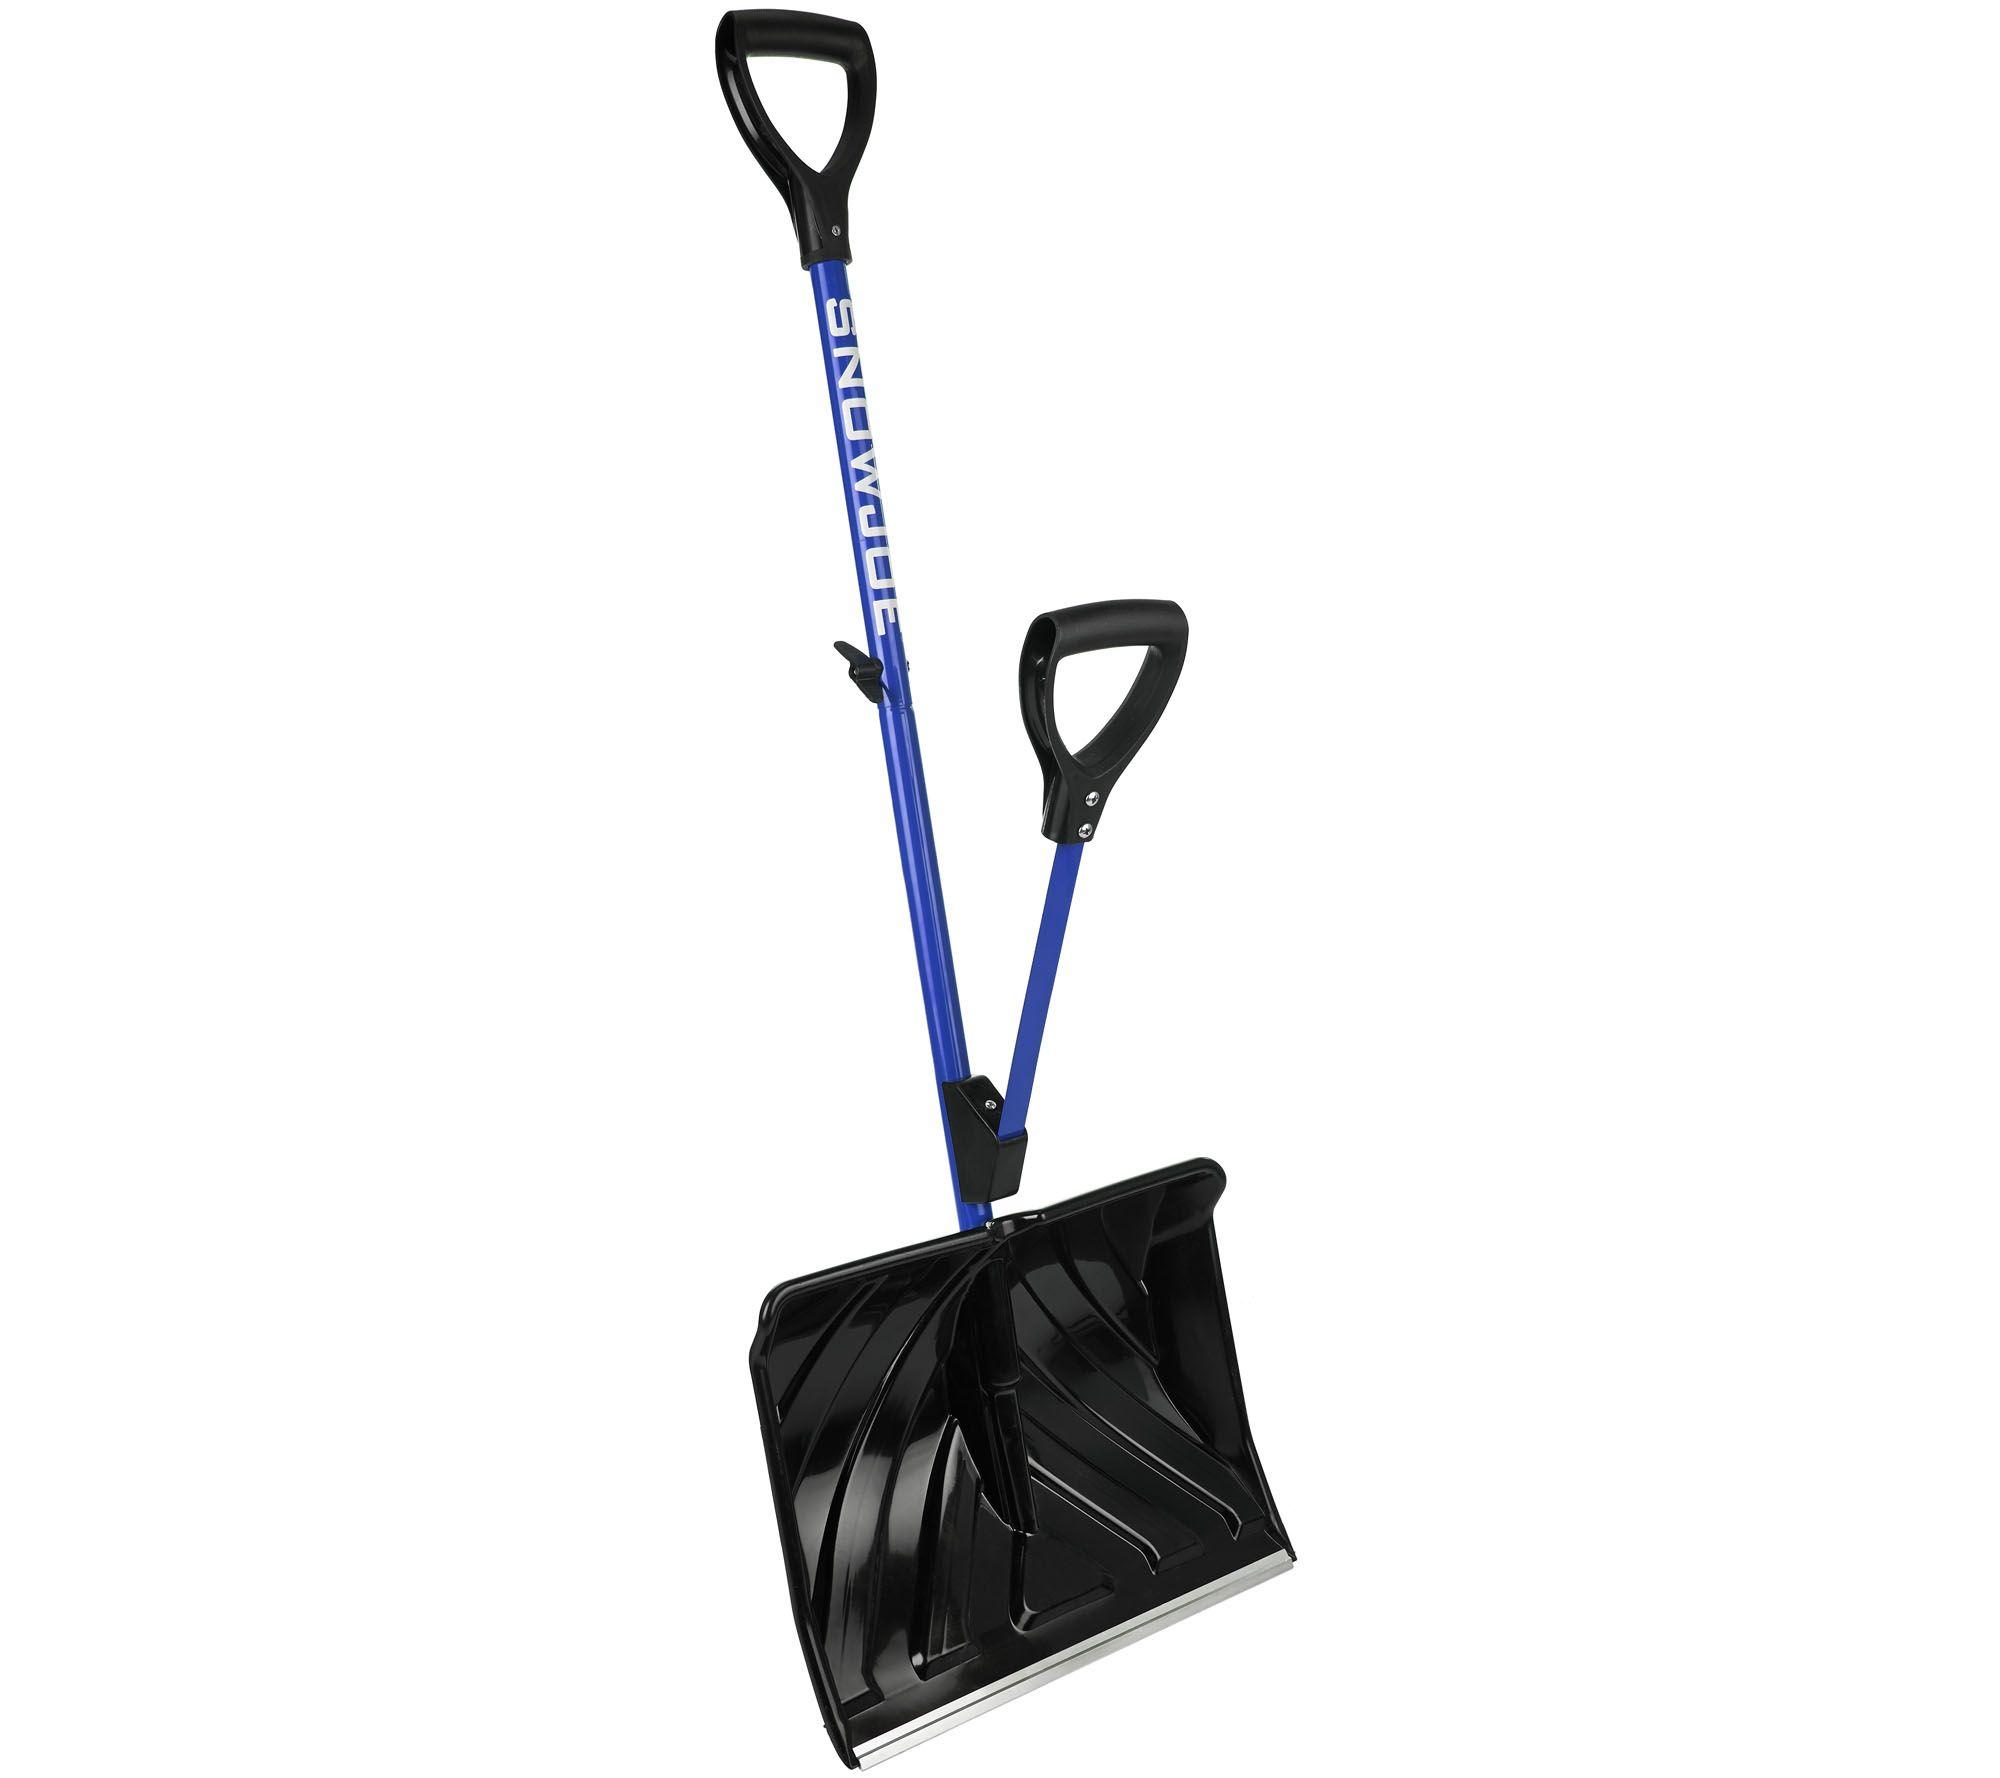 snow joe shovelution snow shovel with spring assist handle — qvc